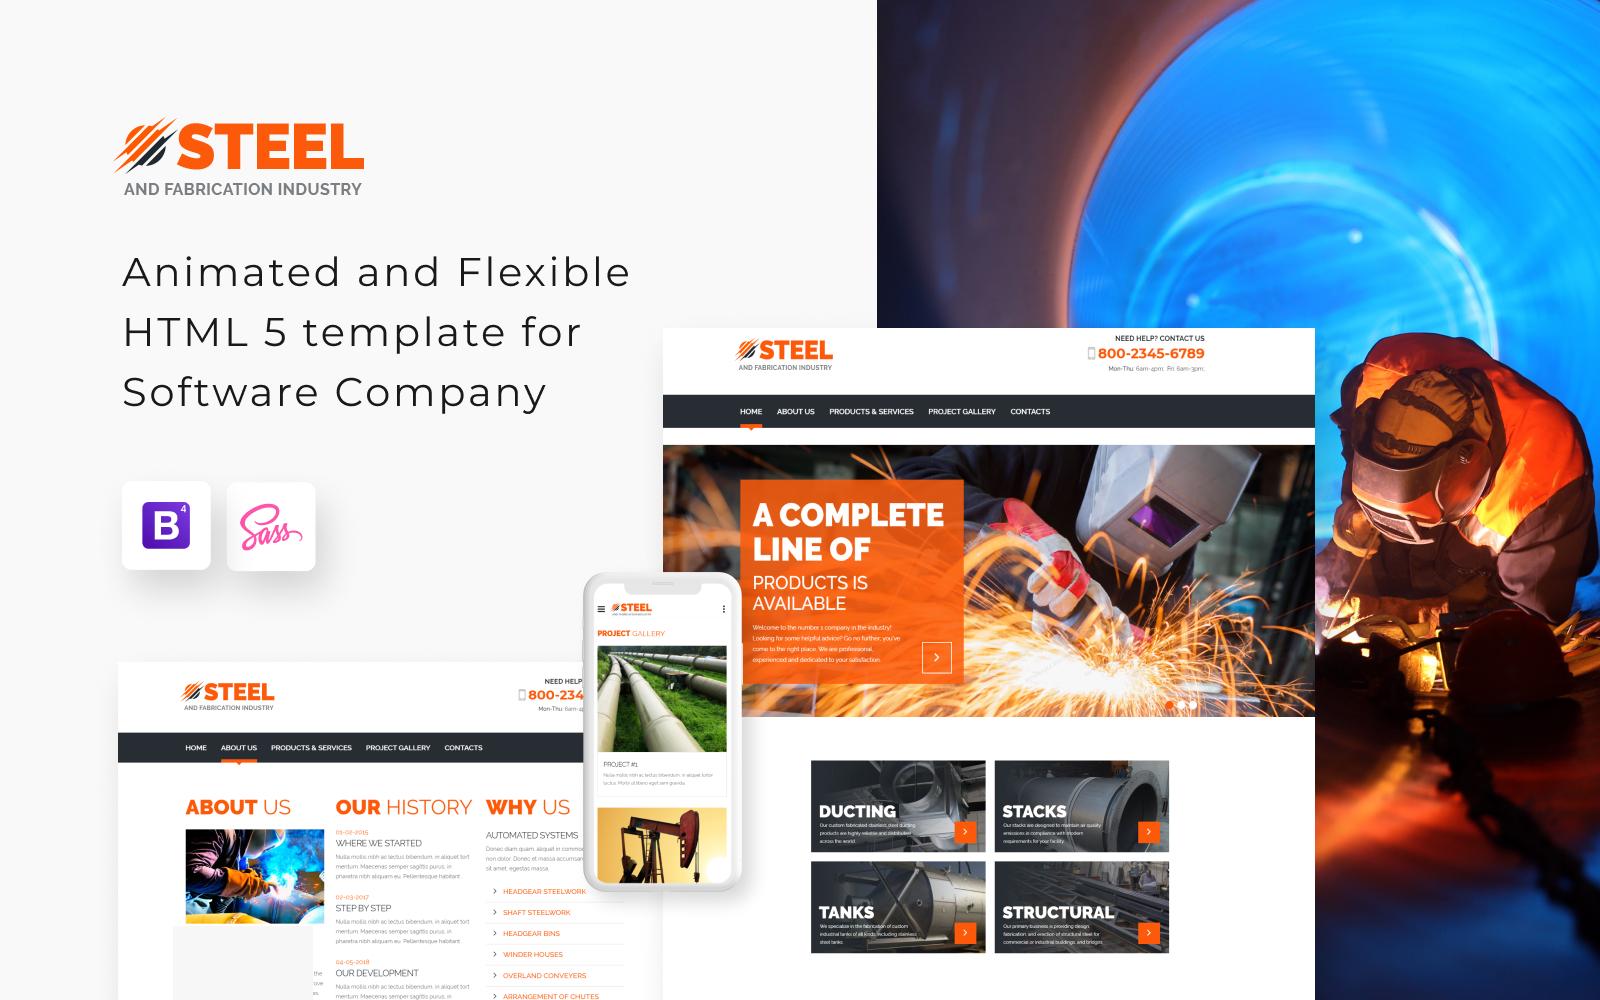 """Steel - Metal Fabrication Industry Website Template"" 响应式网页模板 #55571"